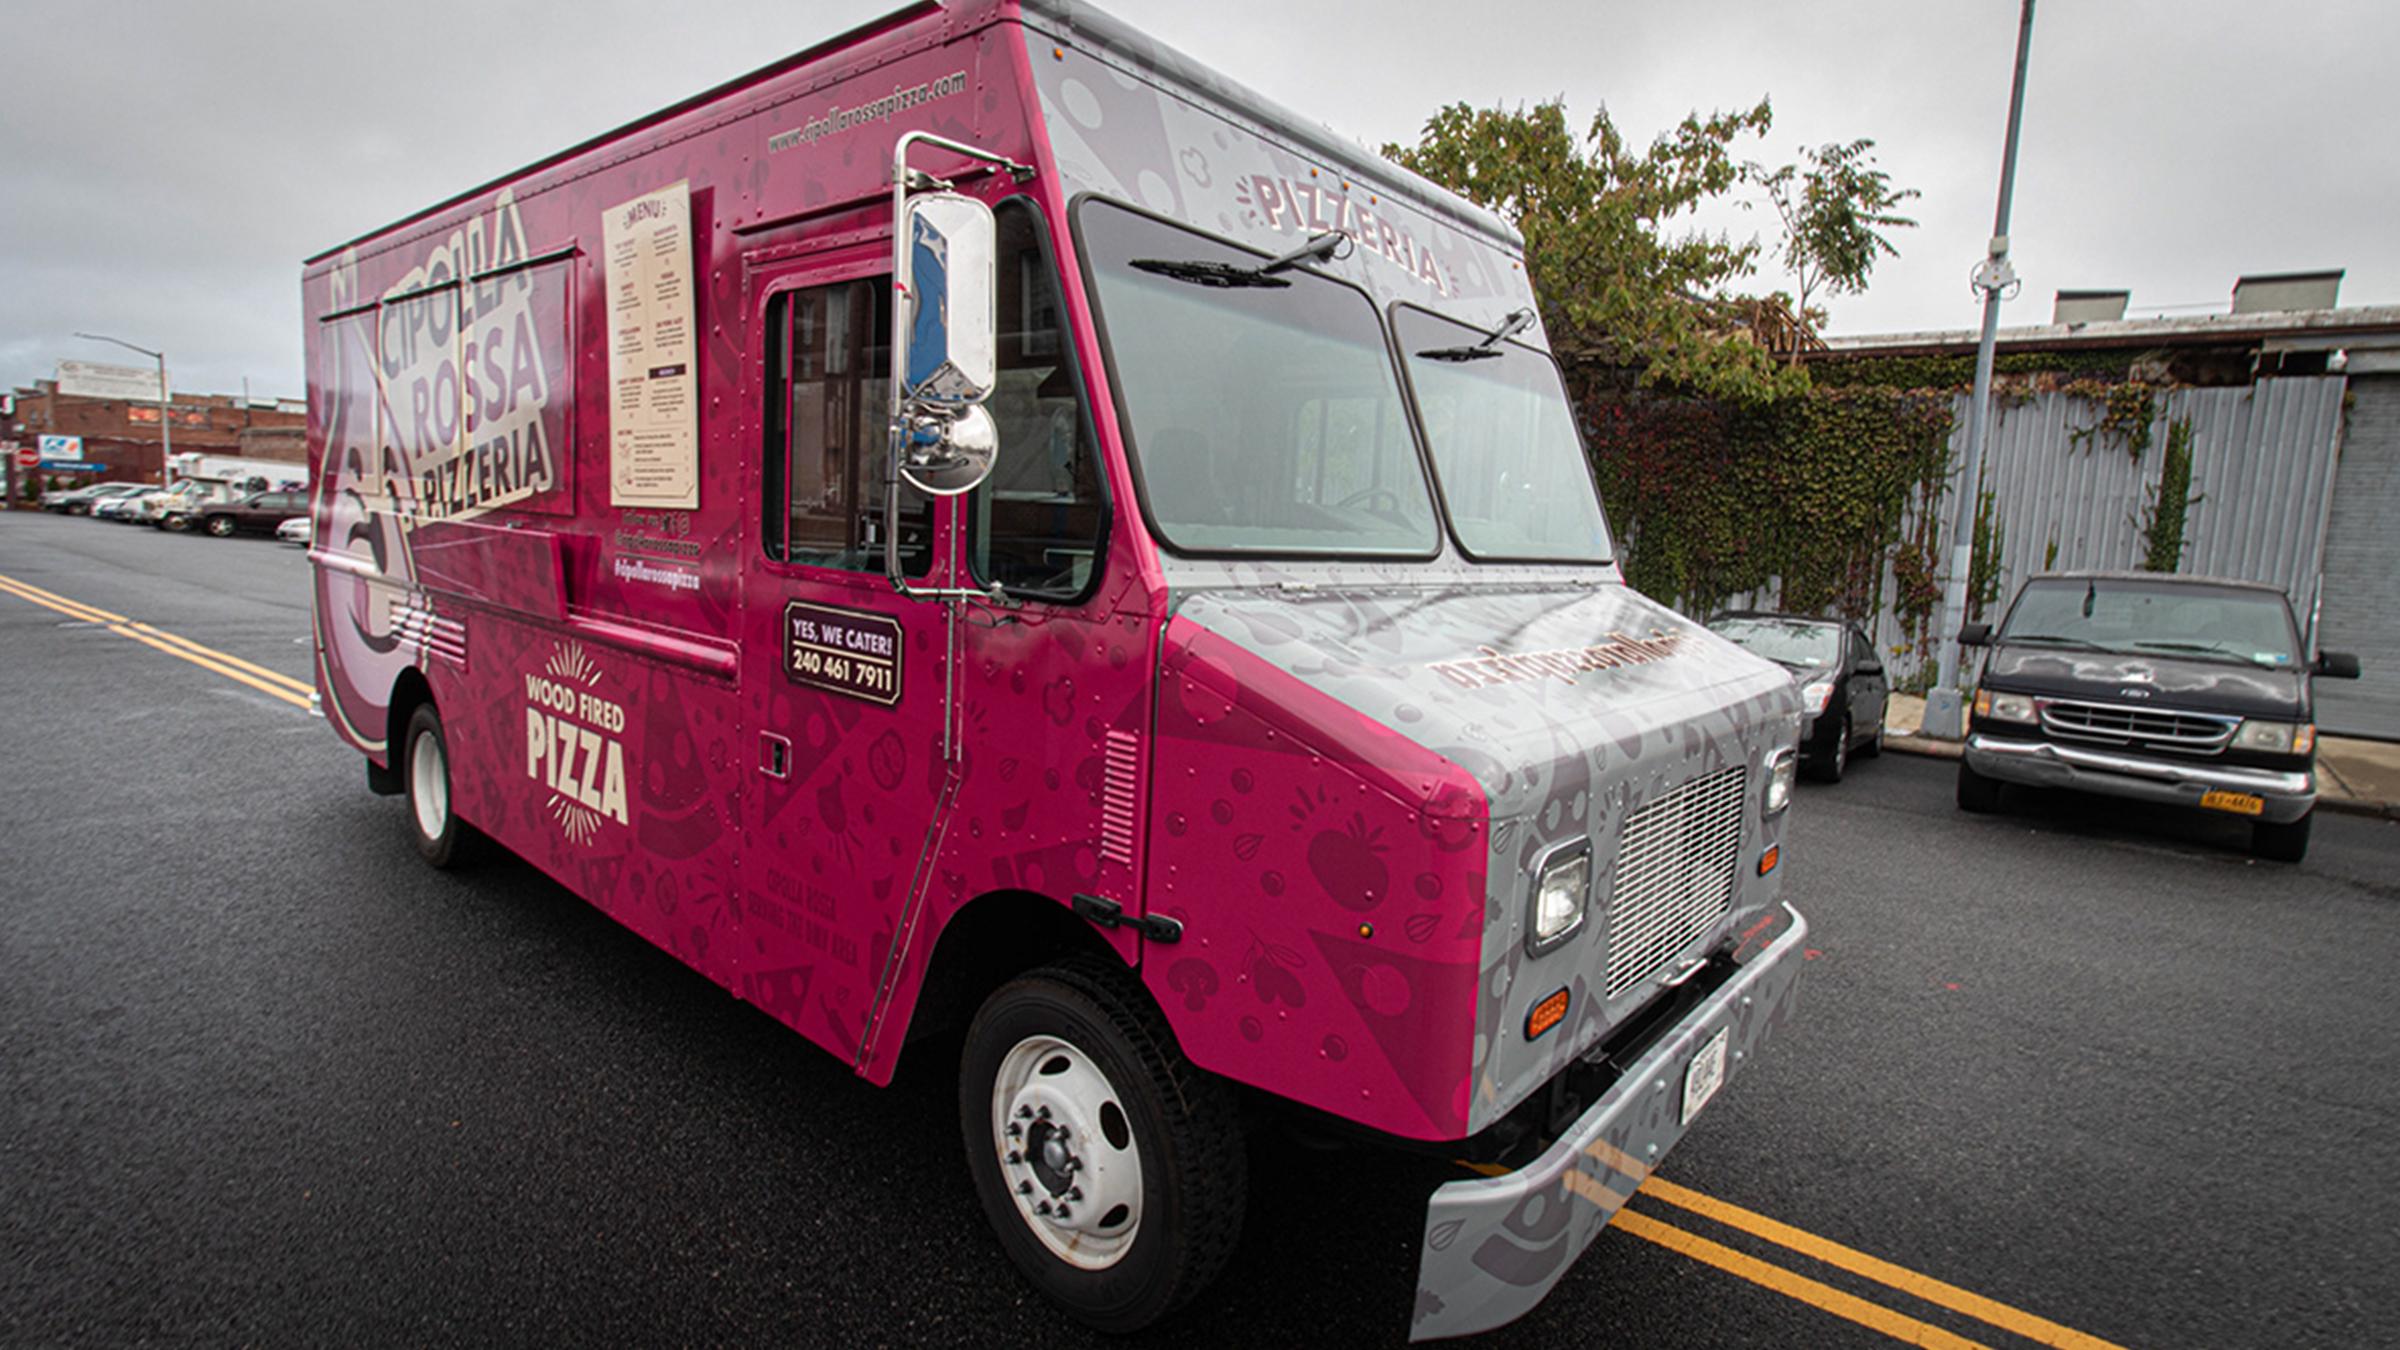 Cipolla Rossa Pizzeria Branding & Food Truck Design